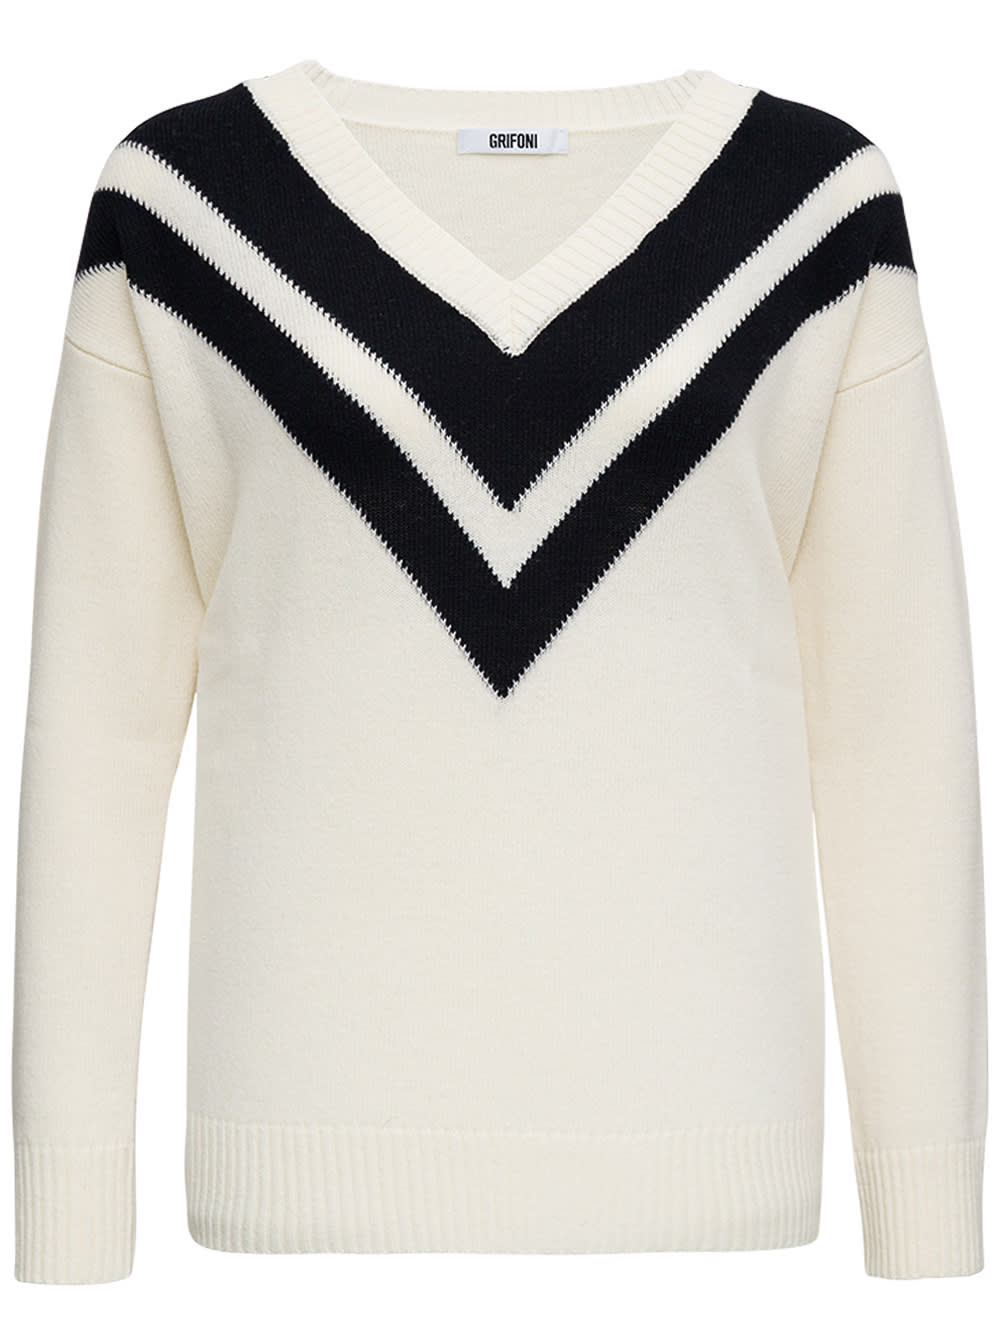 Bicolor Wool V-neck Sweater